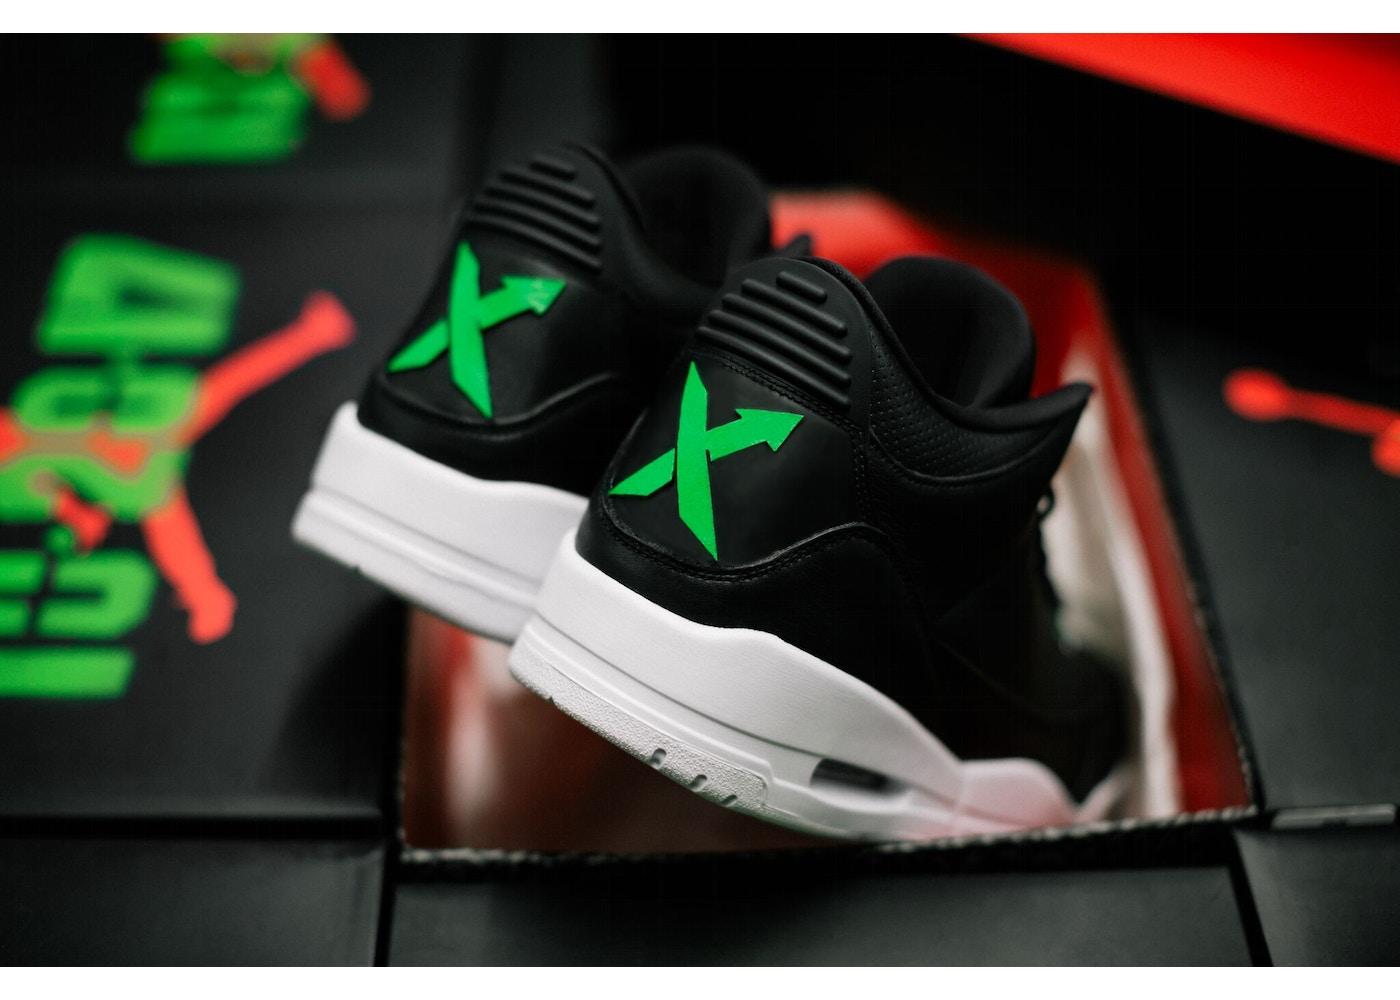 lowest discount buy cheap cheap price Air Jordan 3 Shoes - New Highest Bids